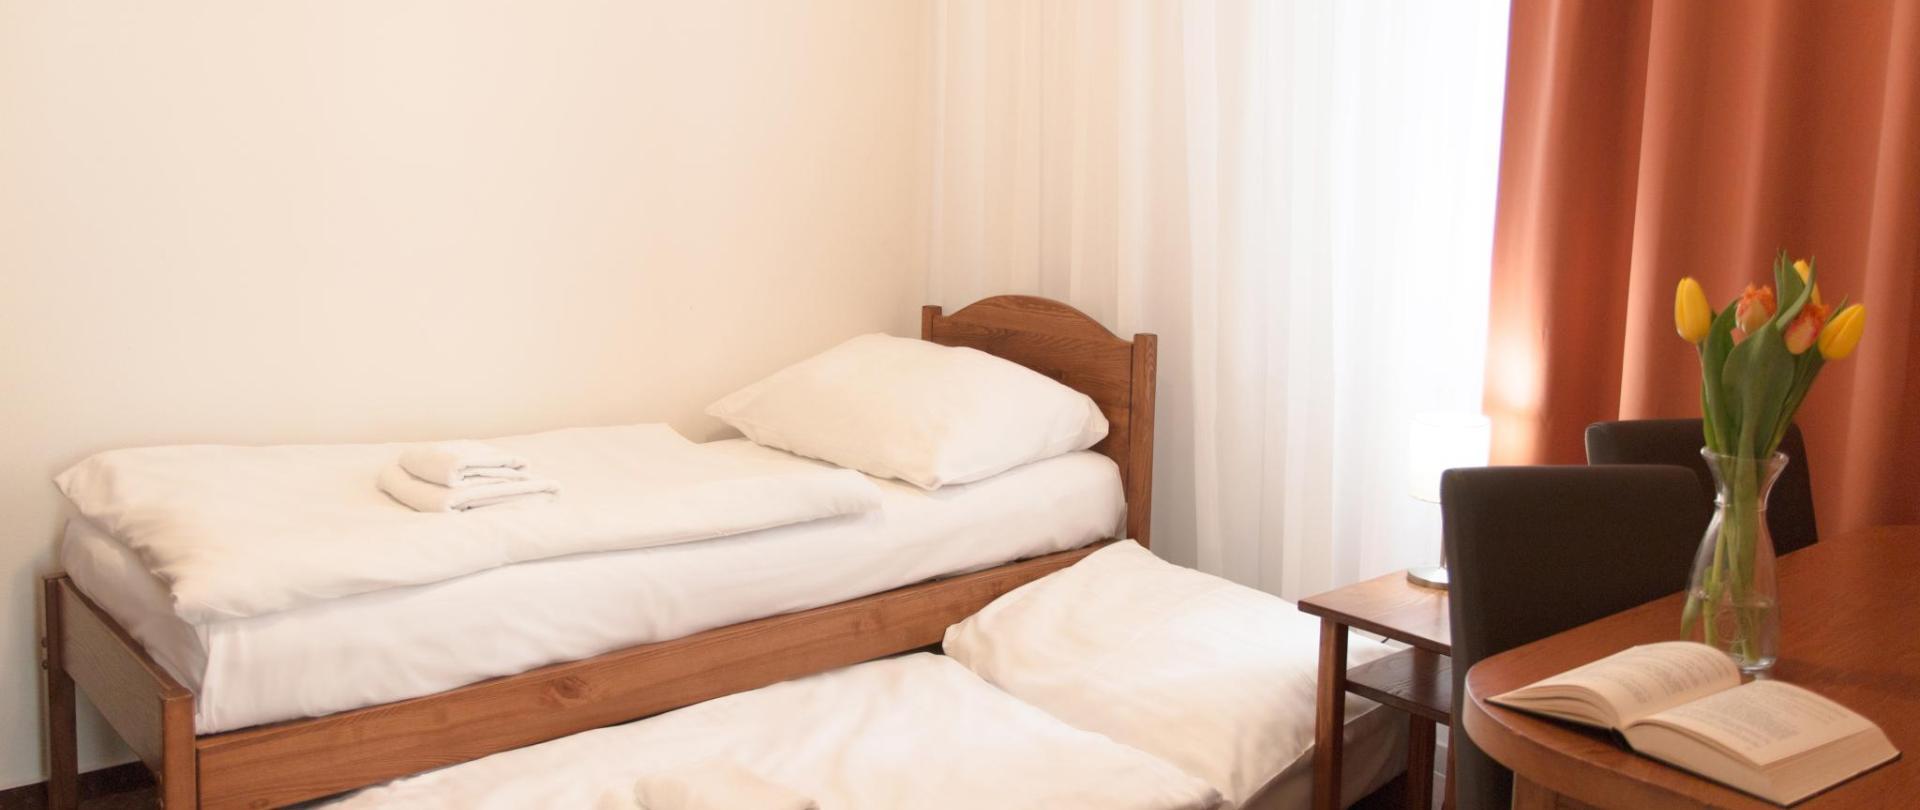 apartman pokoj nalevo obe postele 0387.jpg